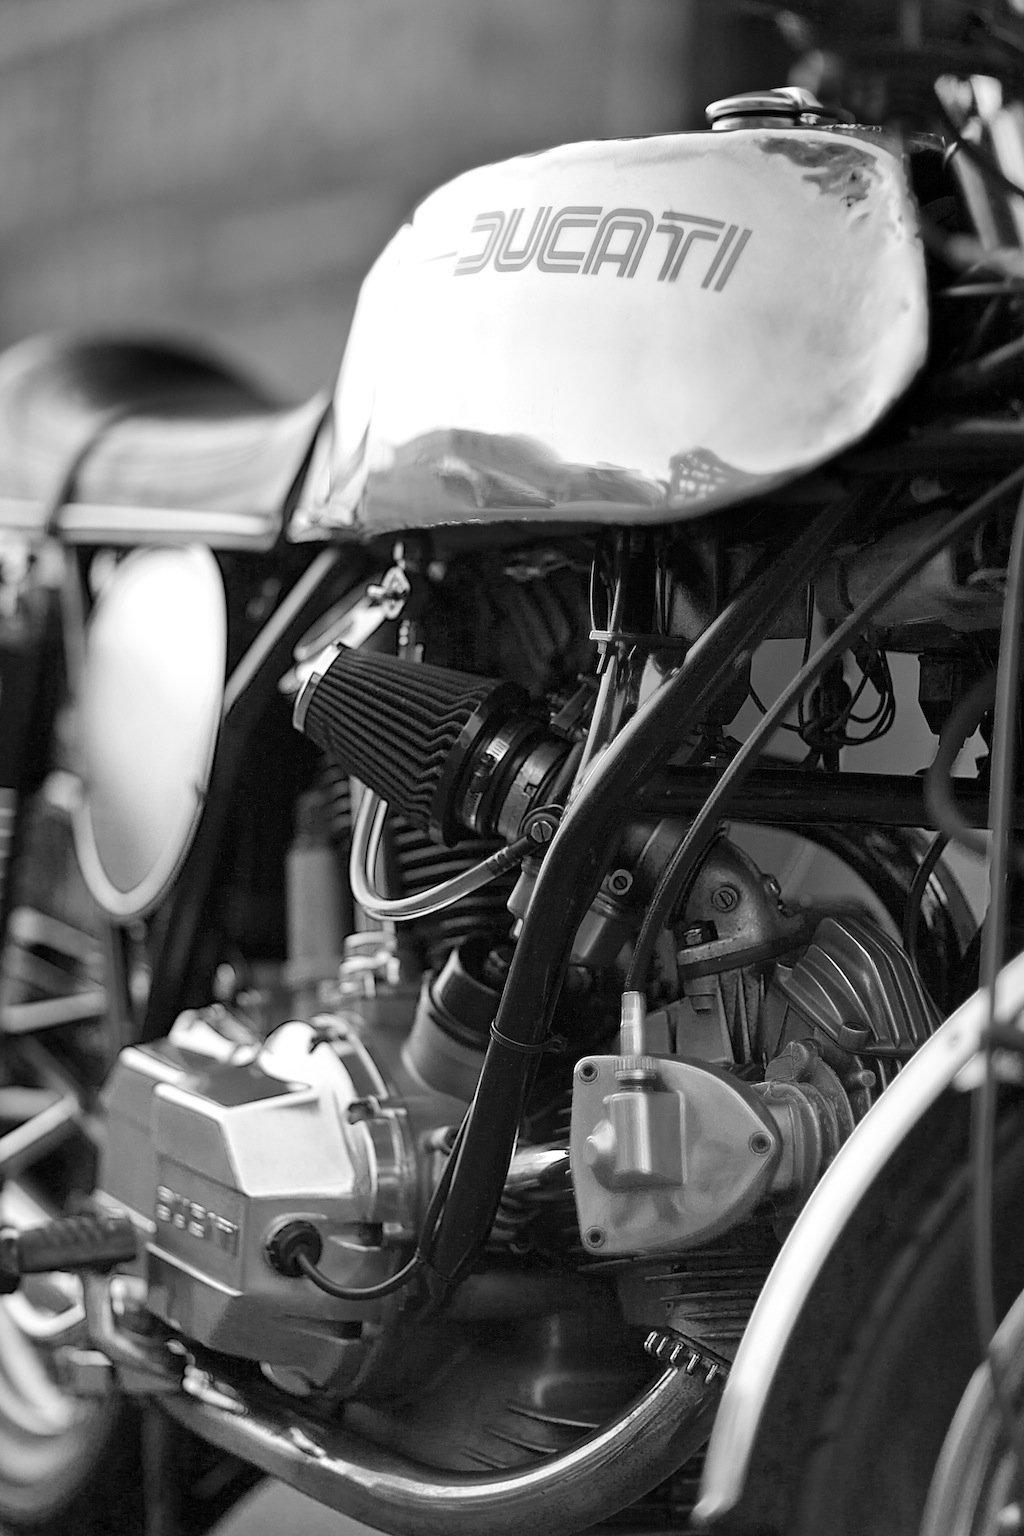 20R9959 copia Ducati 900 GTS de Nick Huber